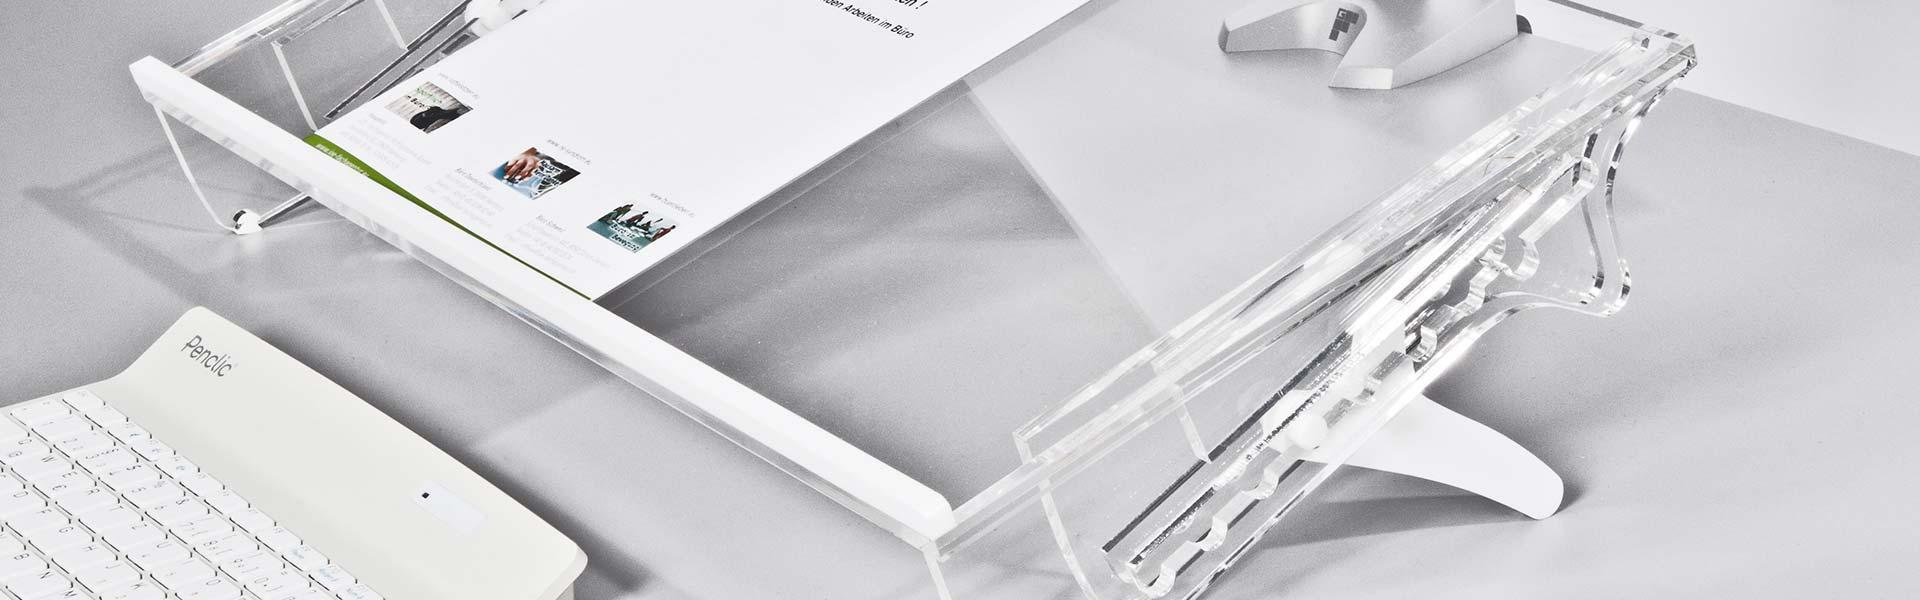 dokumentenhalter orthop dische ergonomische b rost hle aus berlin. Black Bedroom Furniture Sets. Home Design Ideas